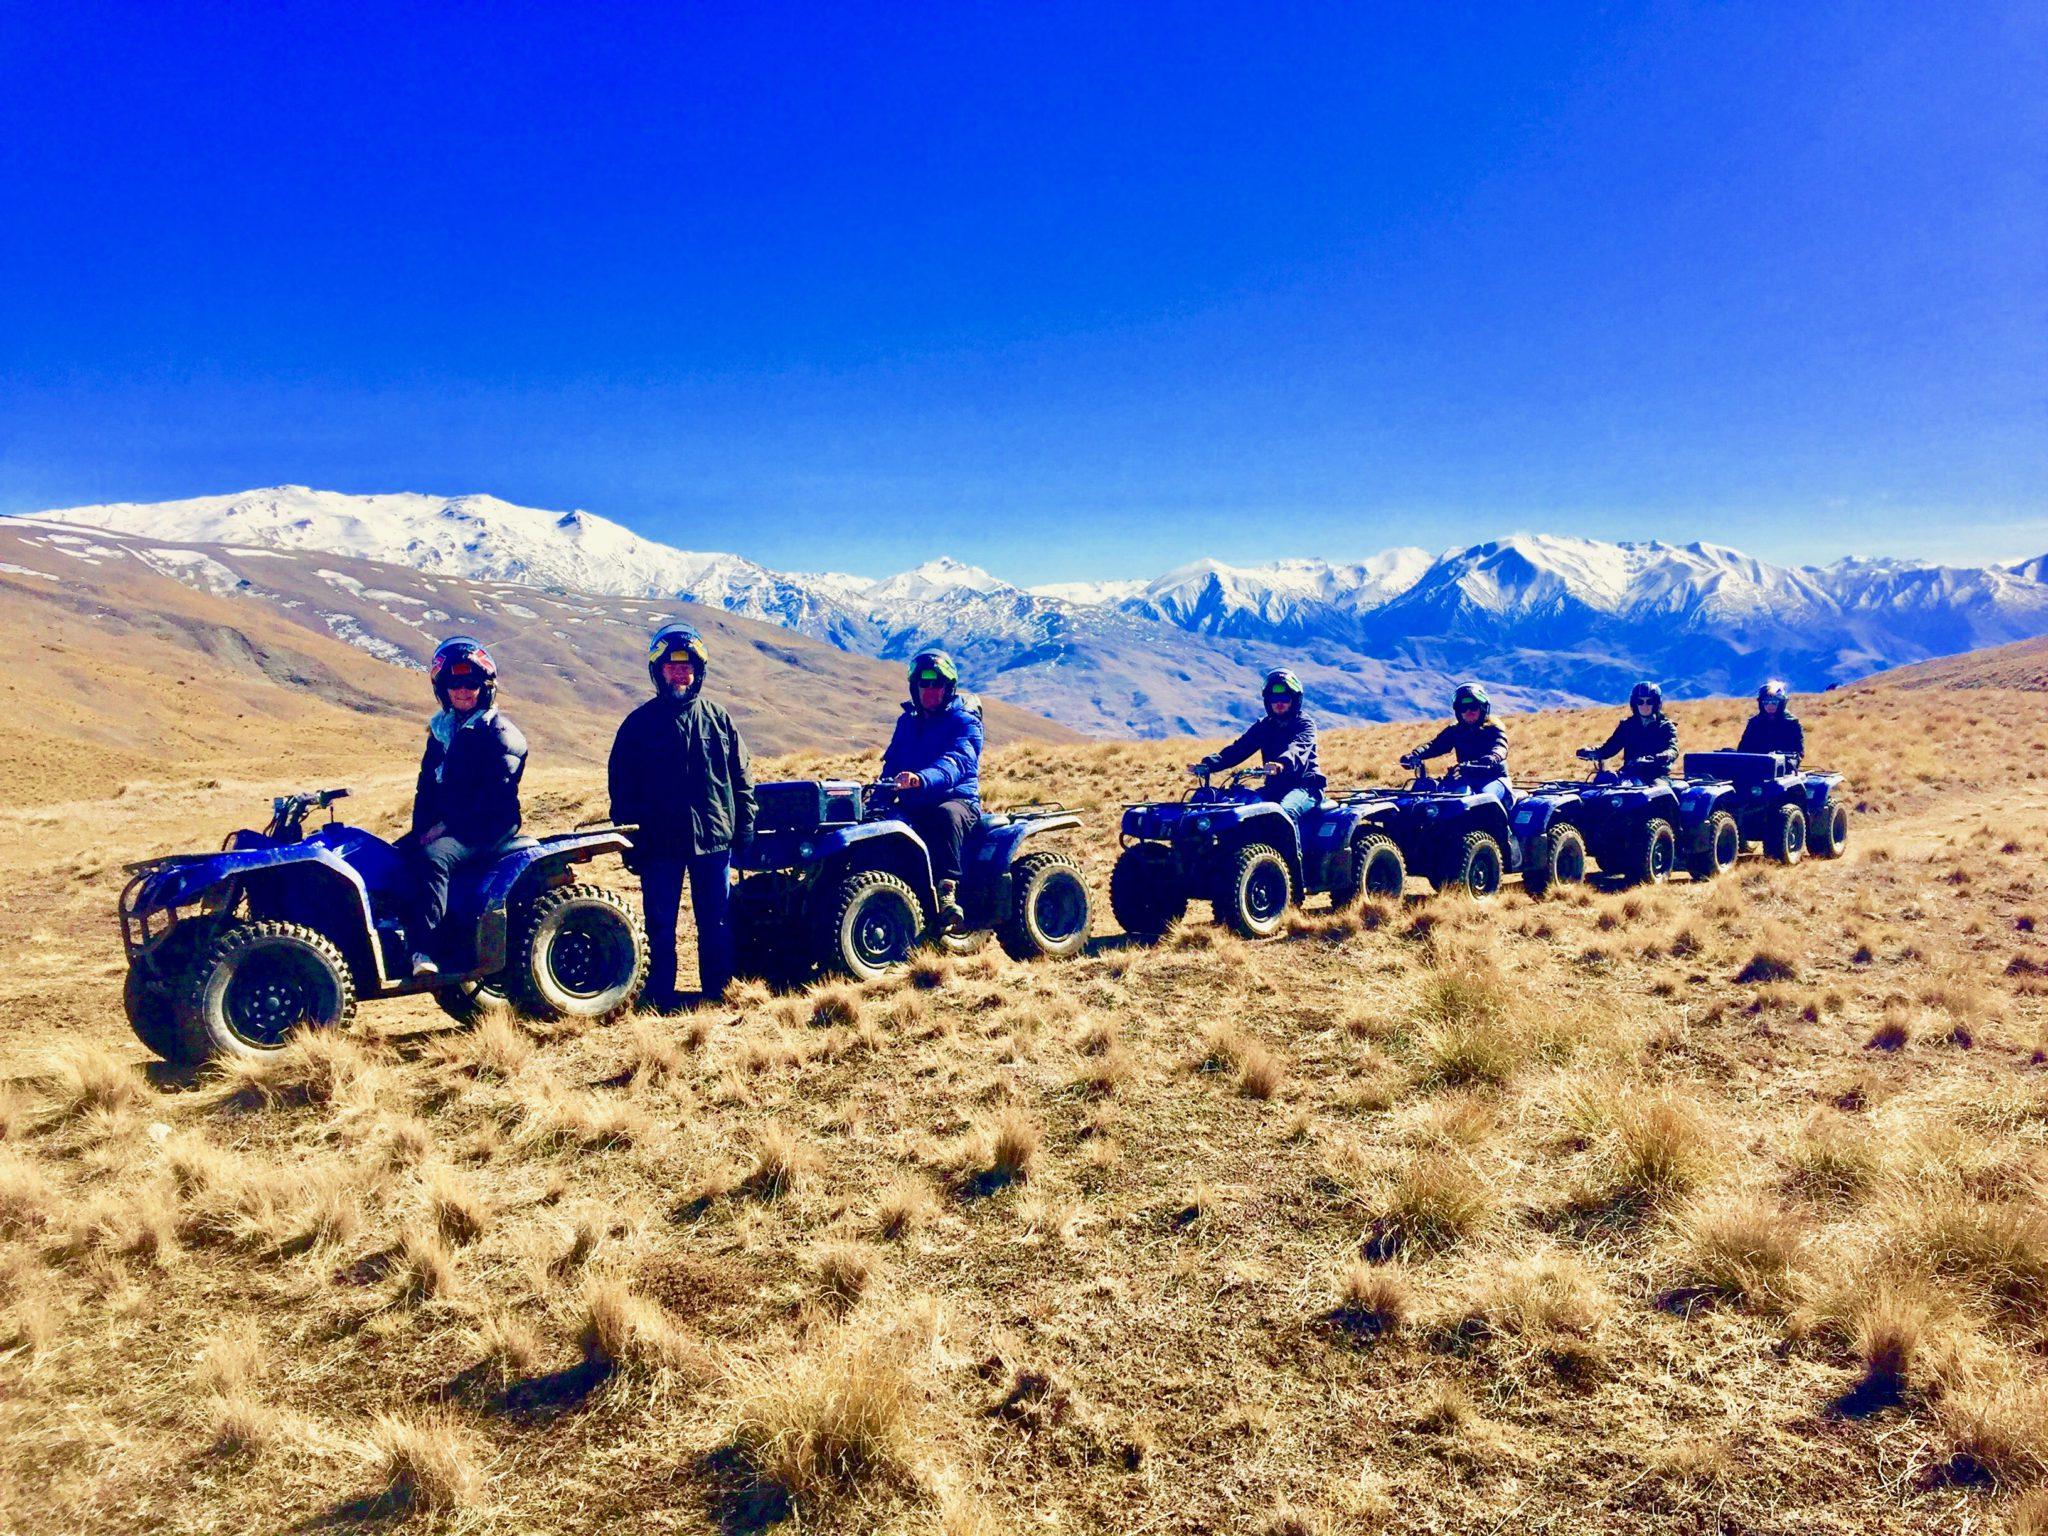 2hr Wanaka Mountain Quad Bike Tour: Quad Biking in New Zealand